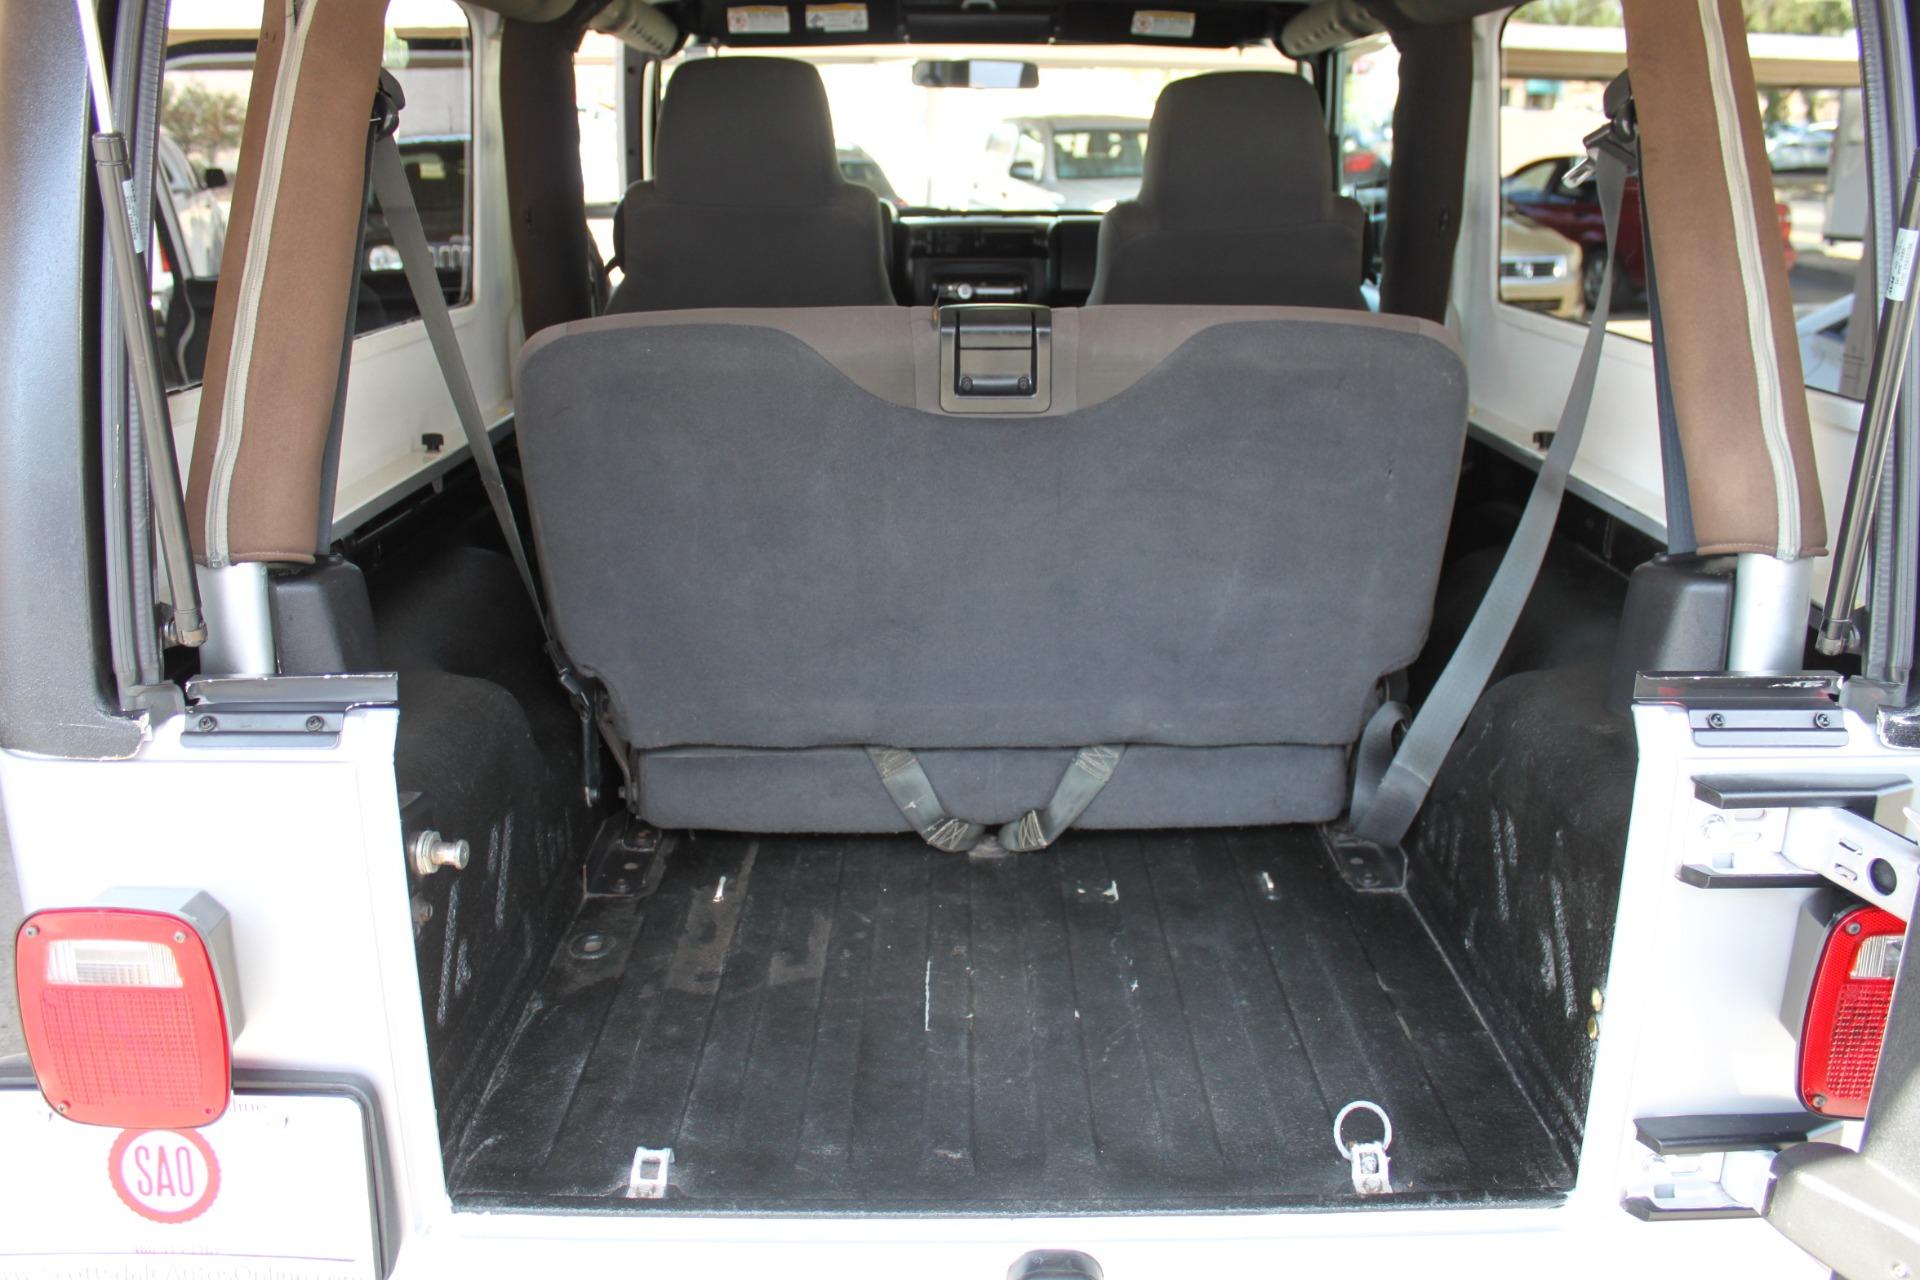 Used-2006-Jeep-Wrangler-Unlimited-LWB-Range-Rover